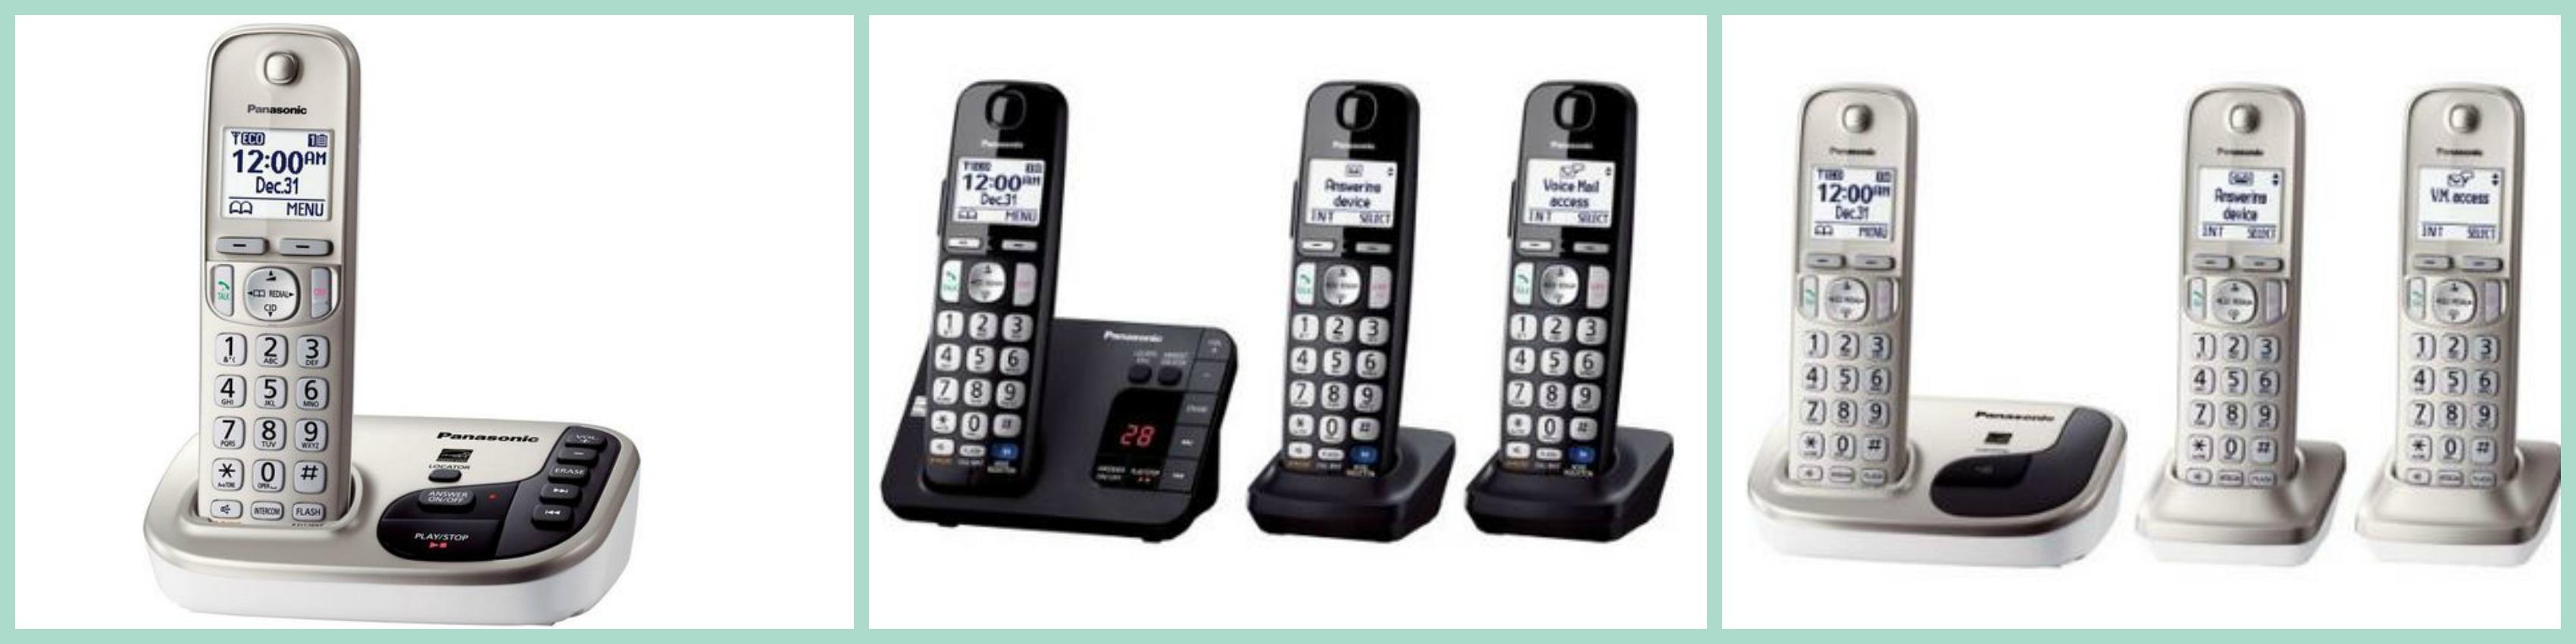 phone coll